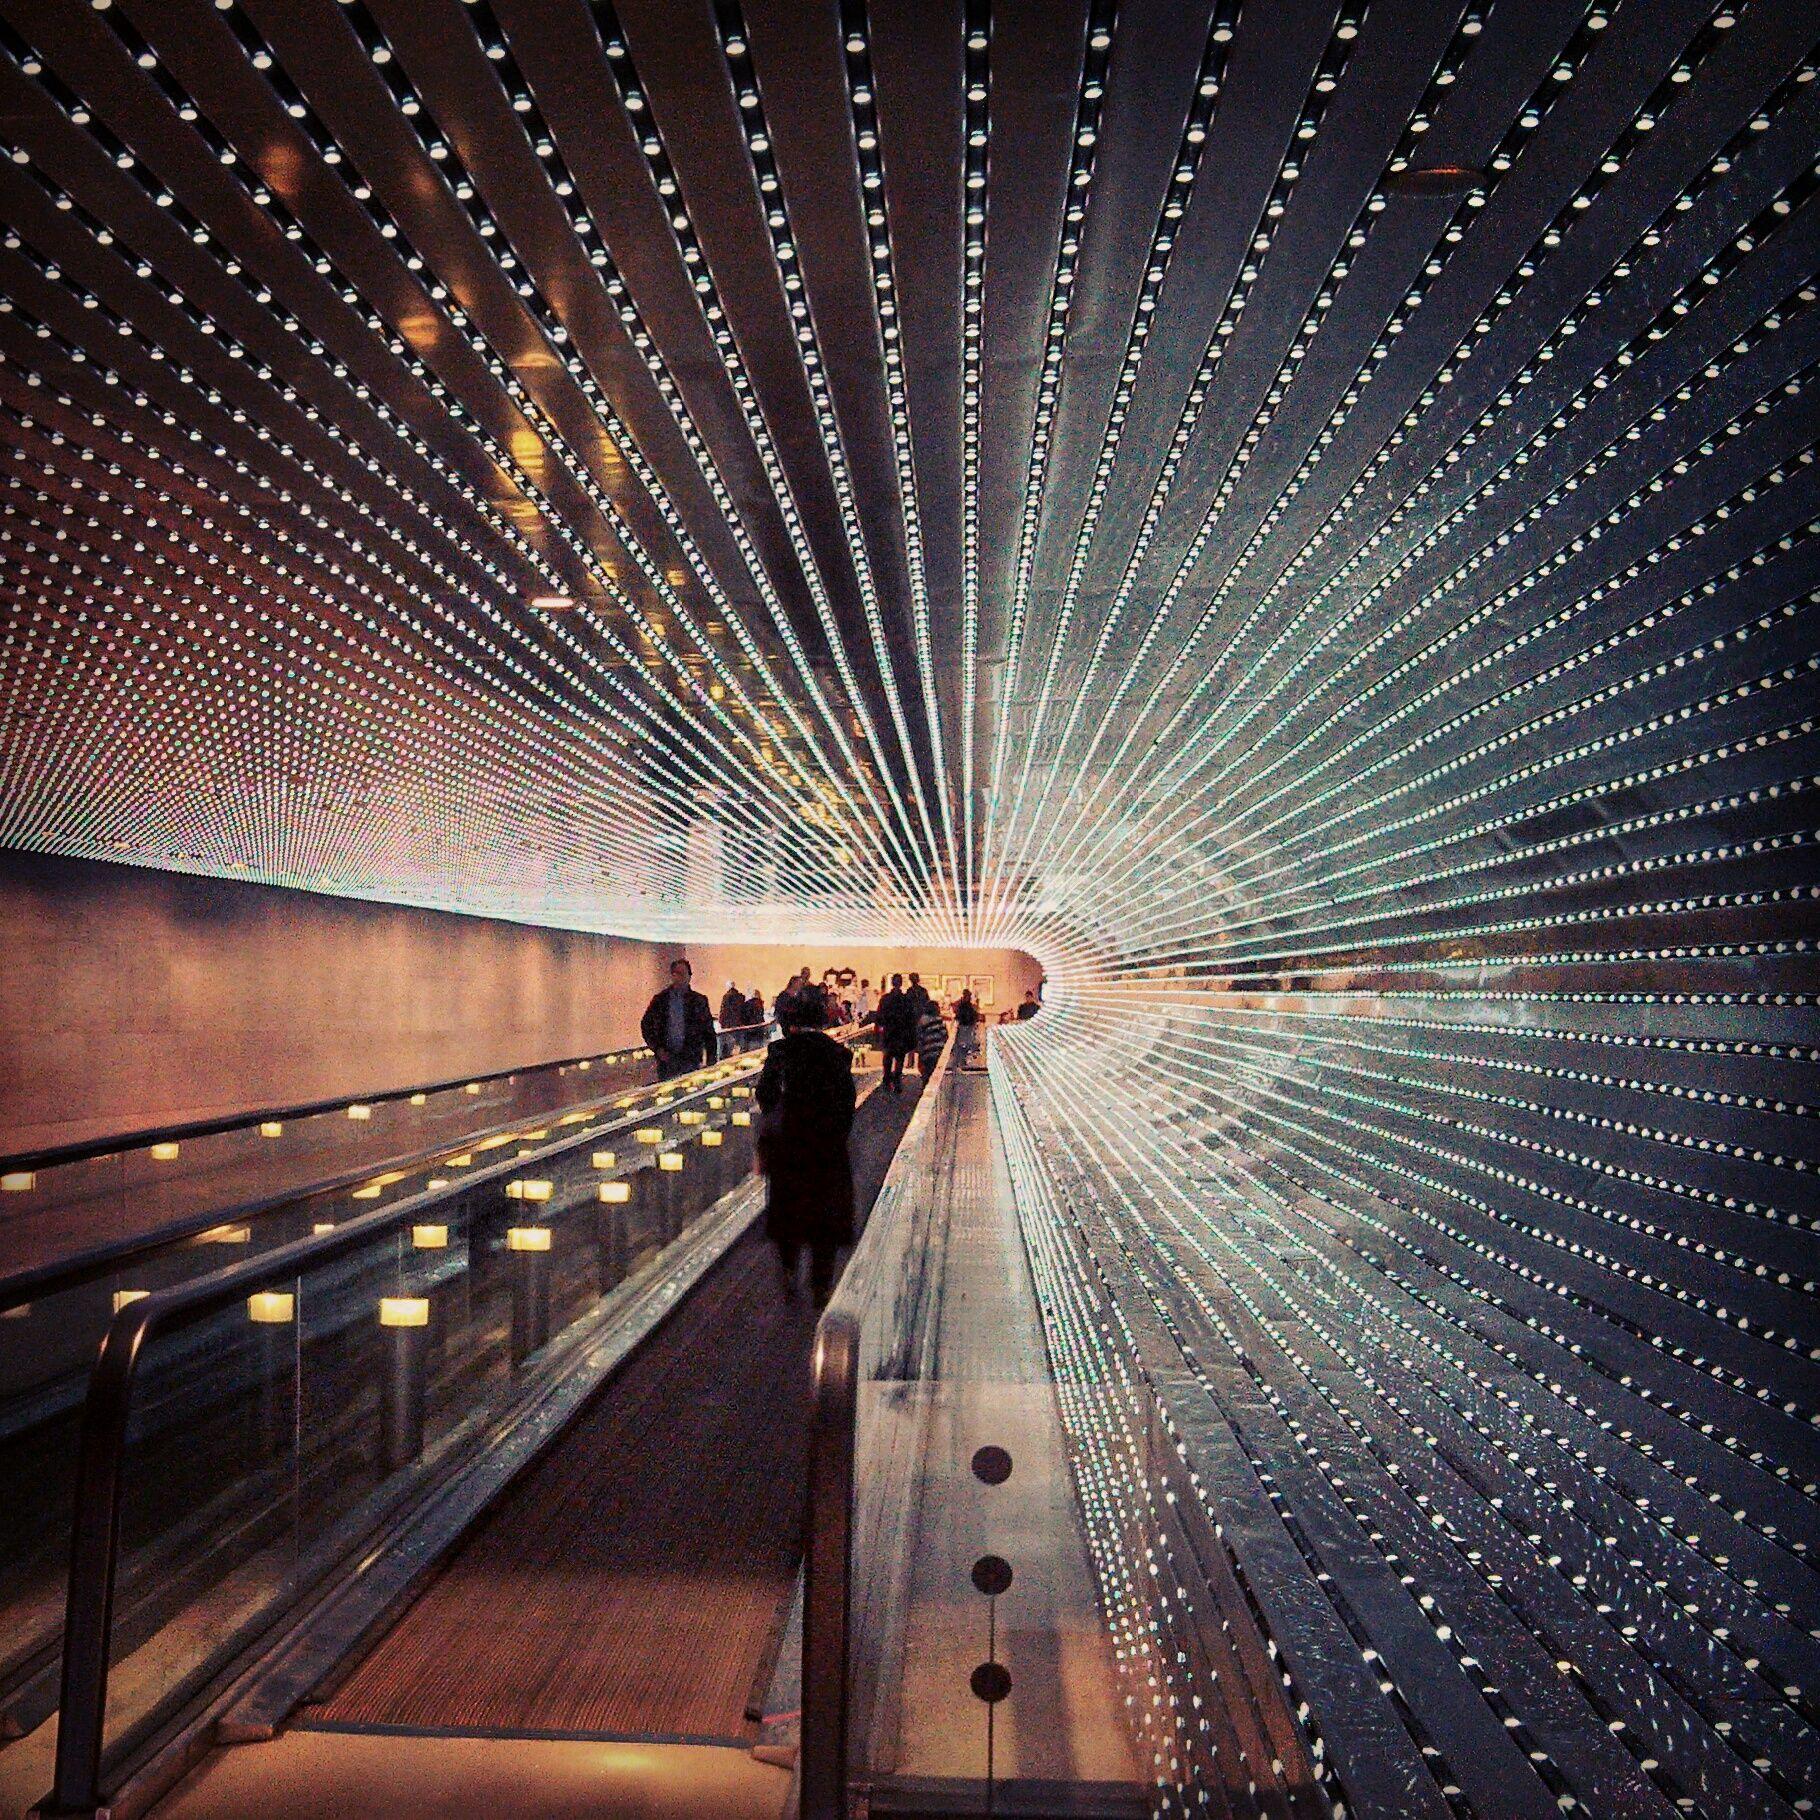 Leo Villareal - Multiverse, National Gallery